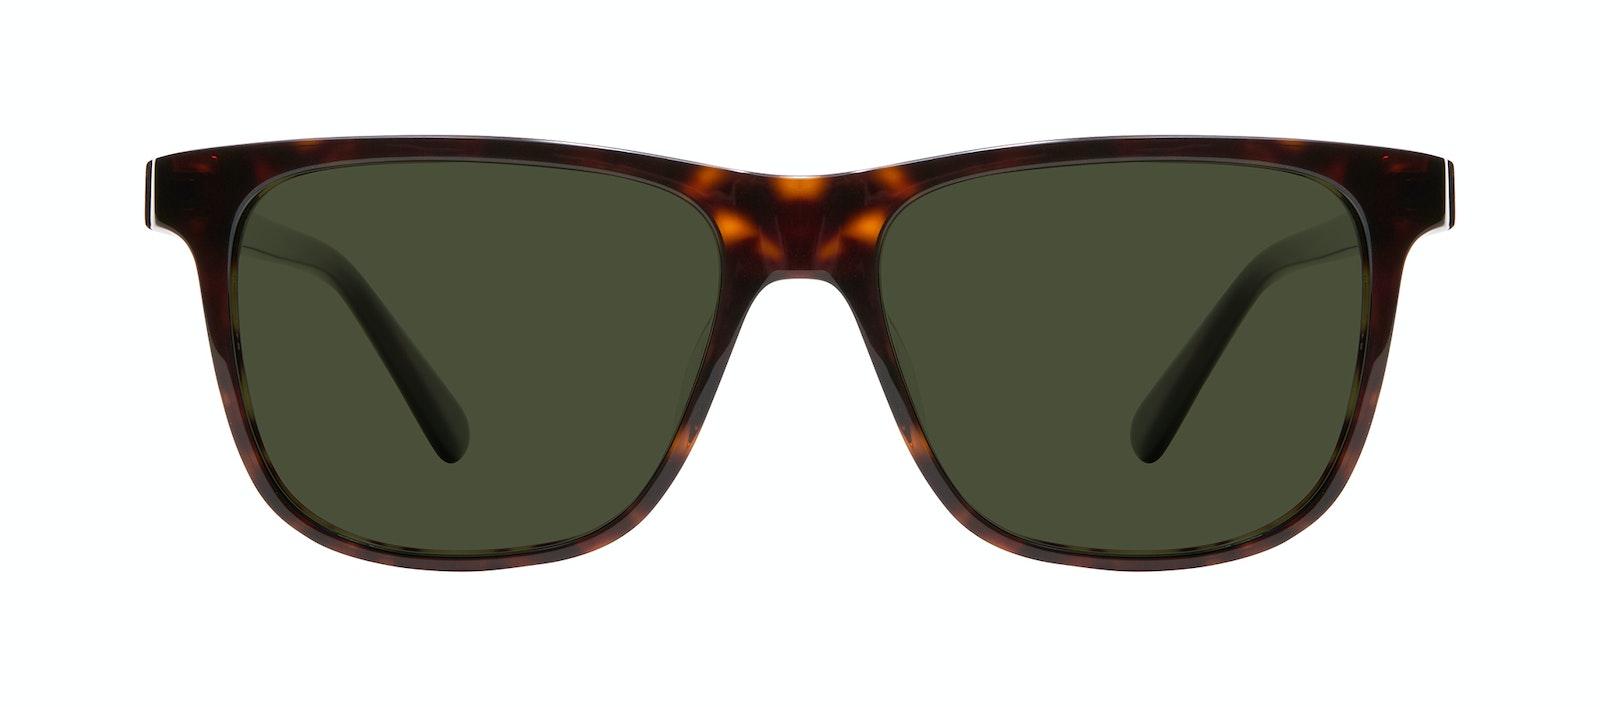 Affordable Fashion Glasses Square Sunglasses Men River Tortoise Front